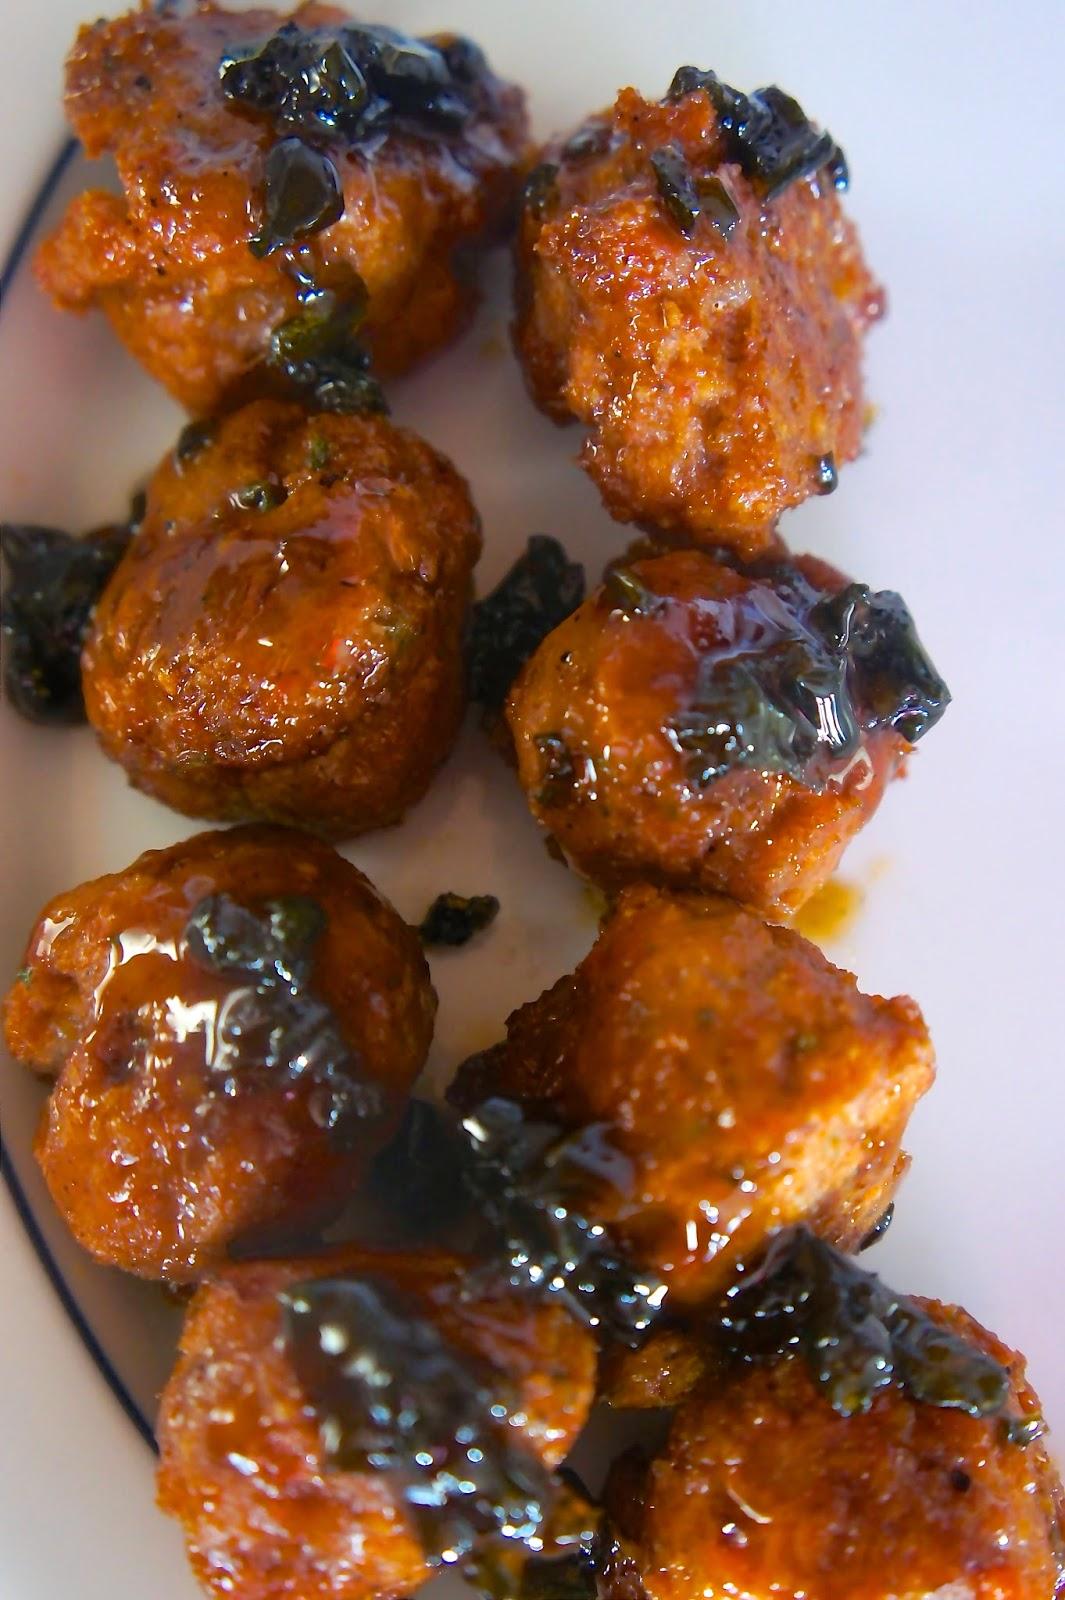 Cherry Coke and Jalapeño Glazed Meatballs: Savory Sweet and Satisfying